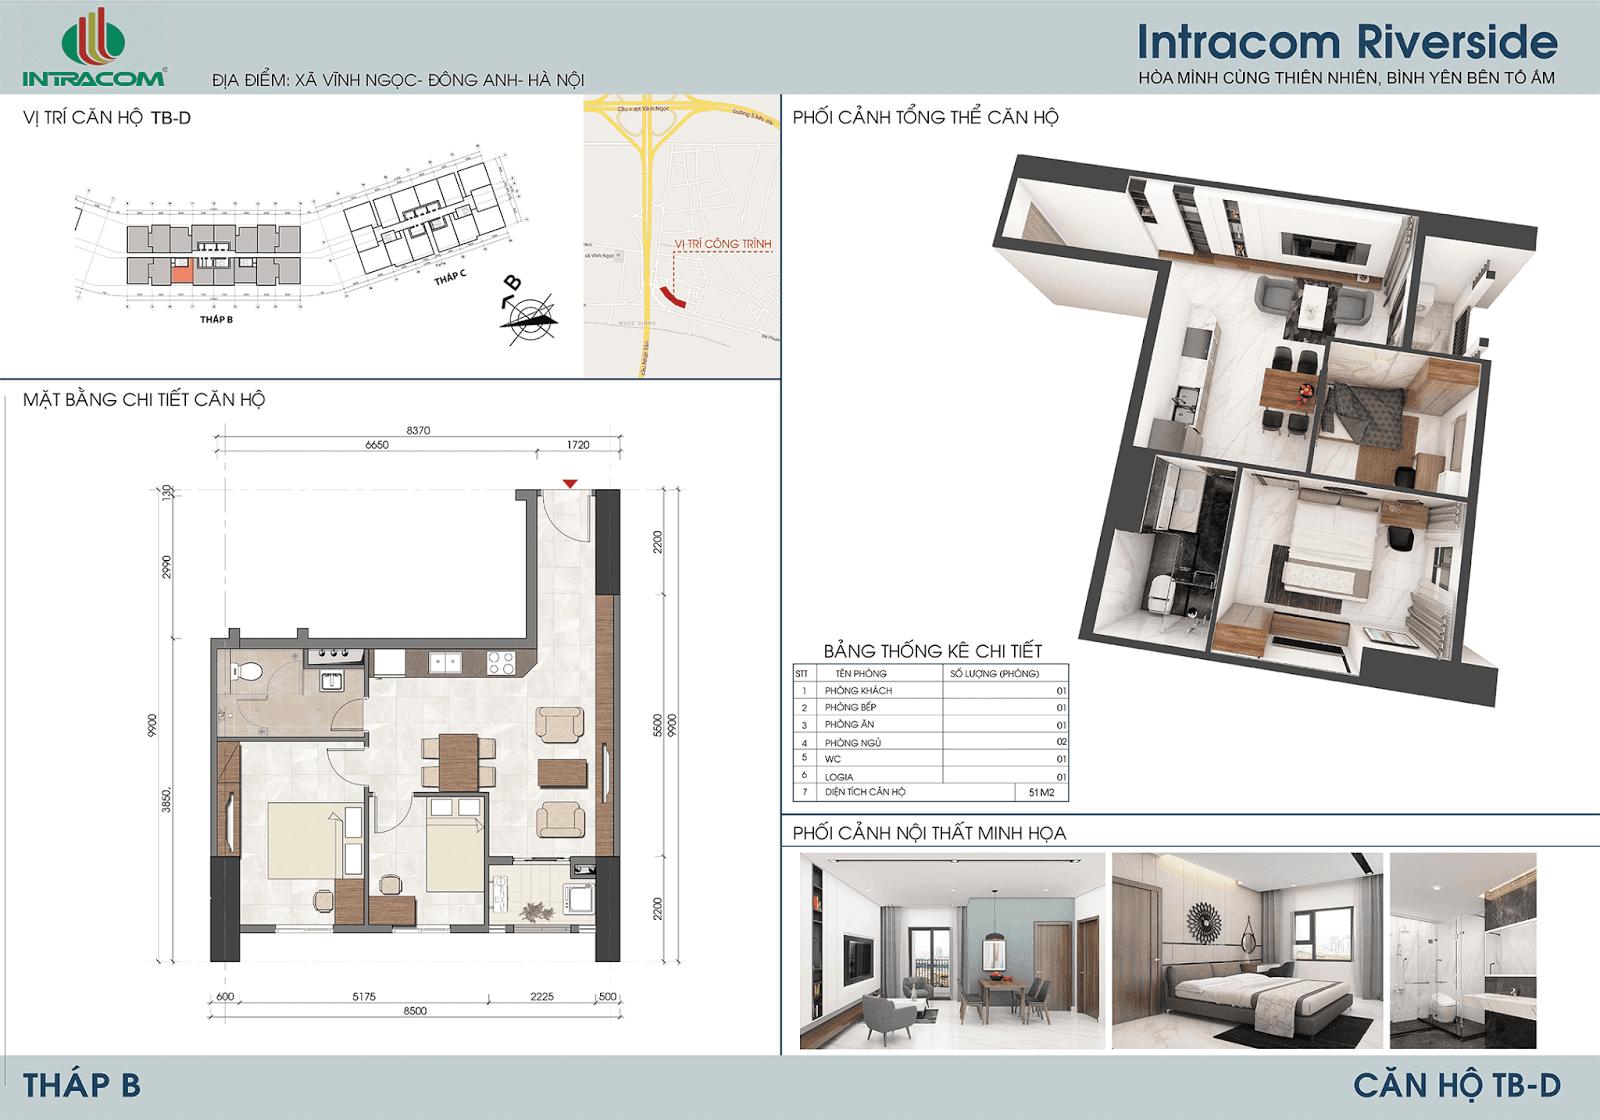 Thiết kế căn 11 - 14 - 64m2